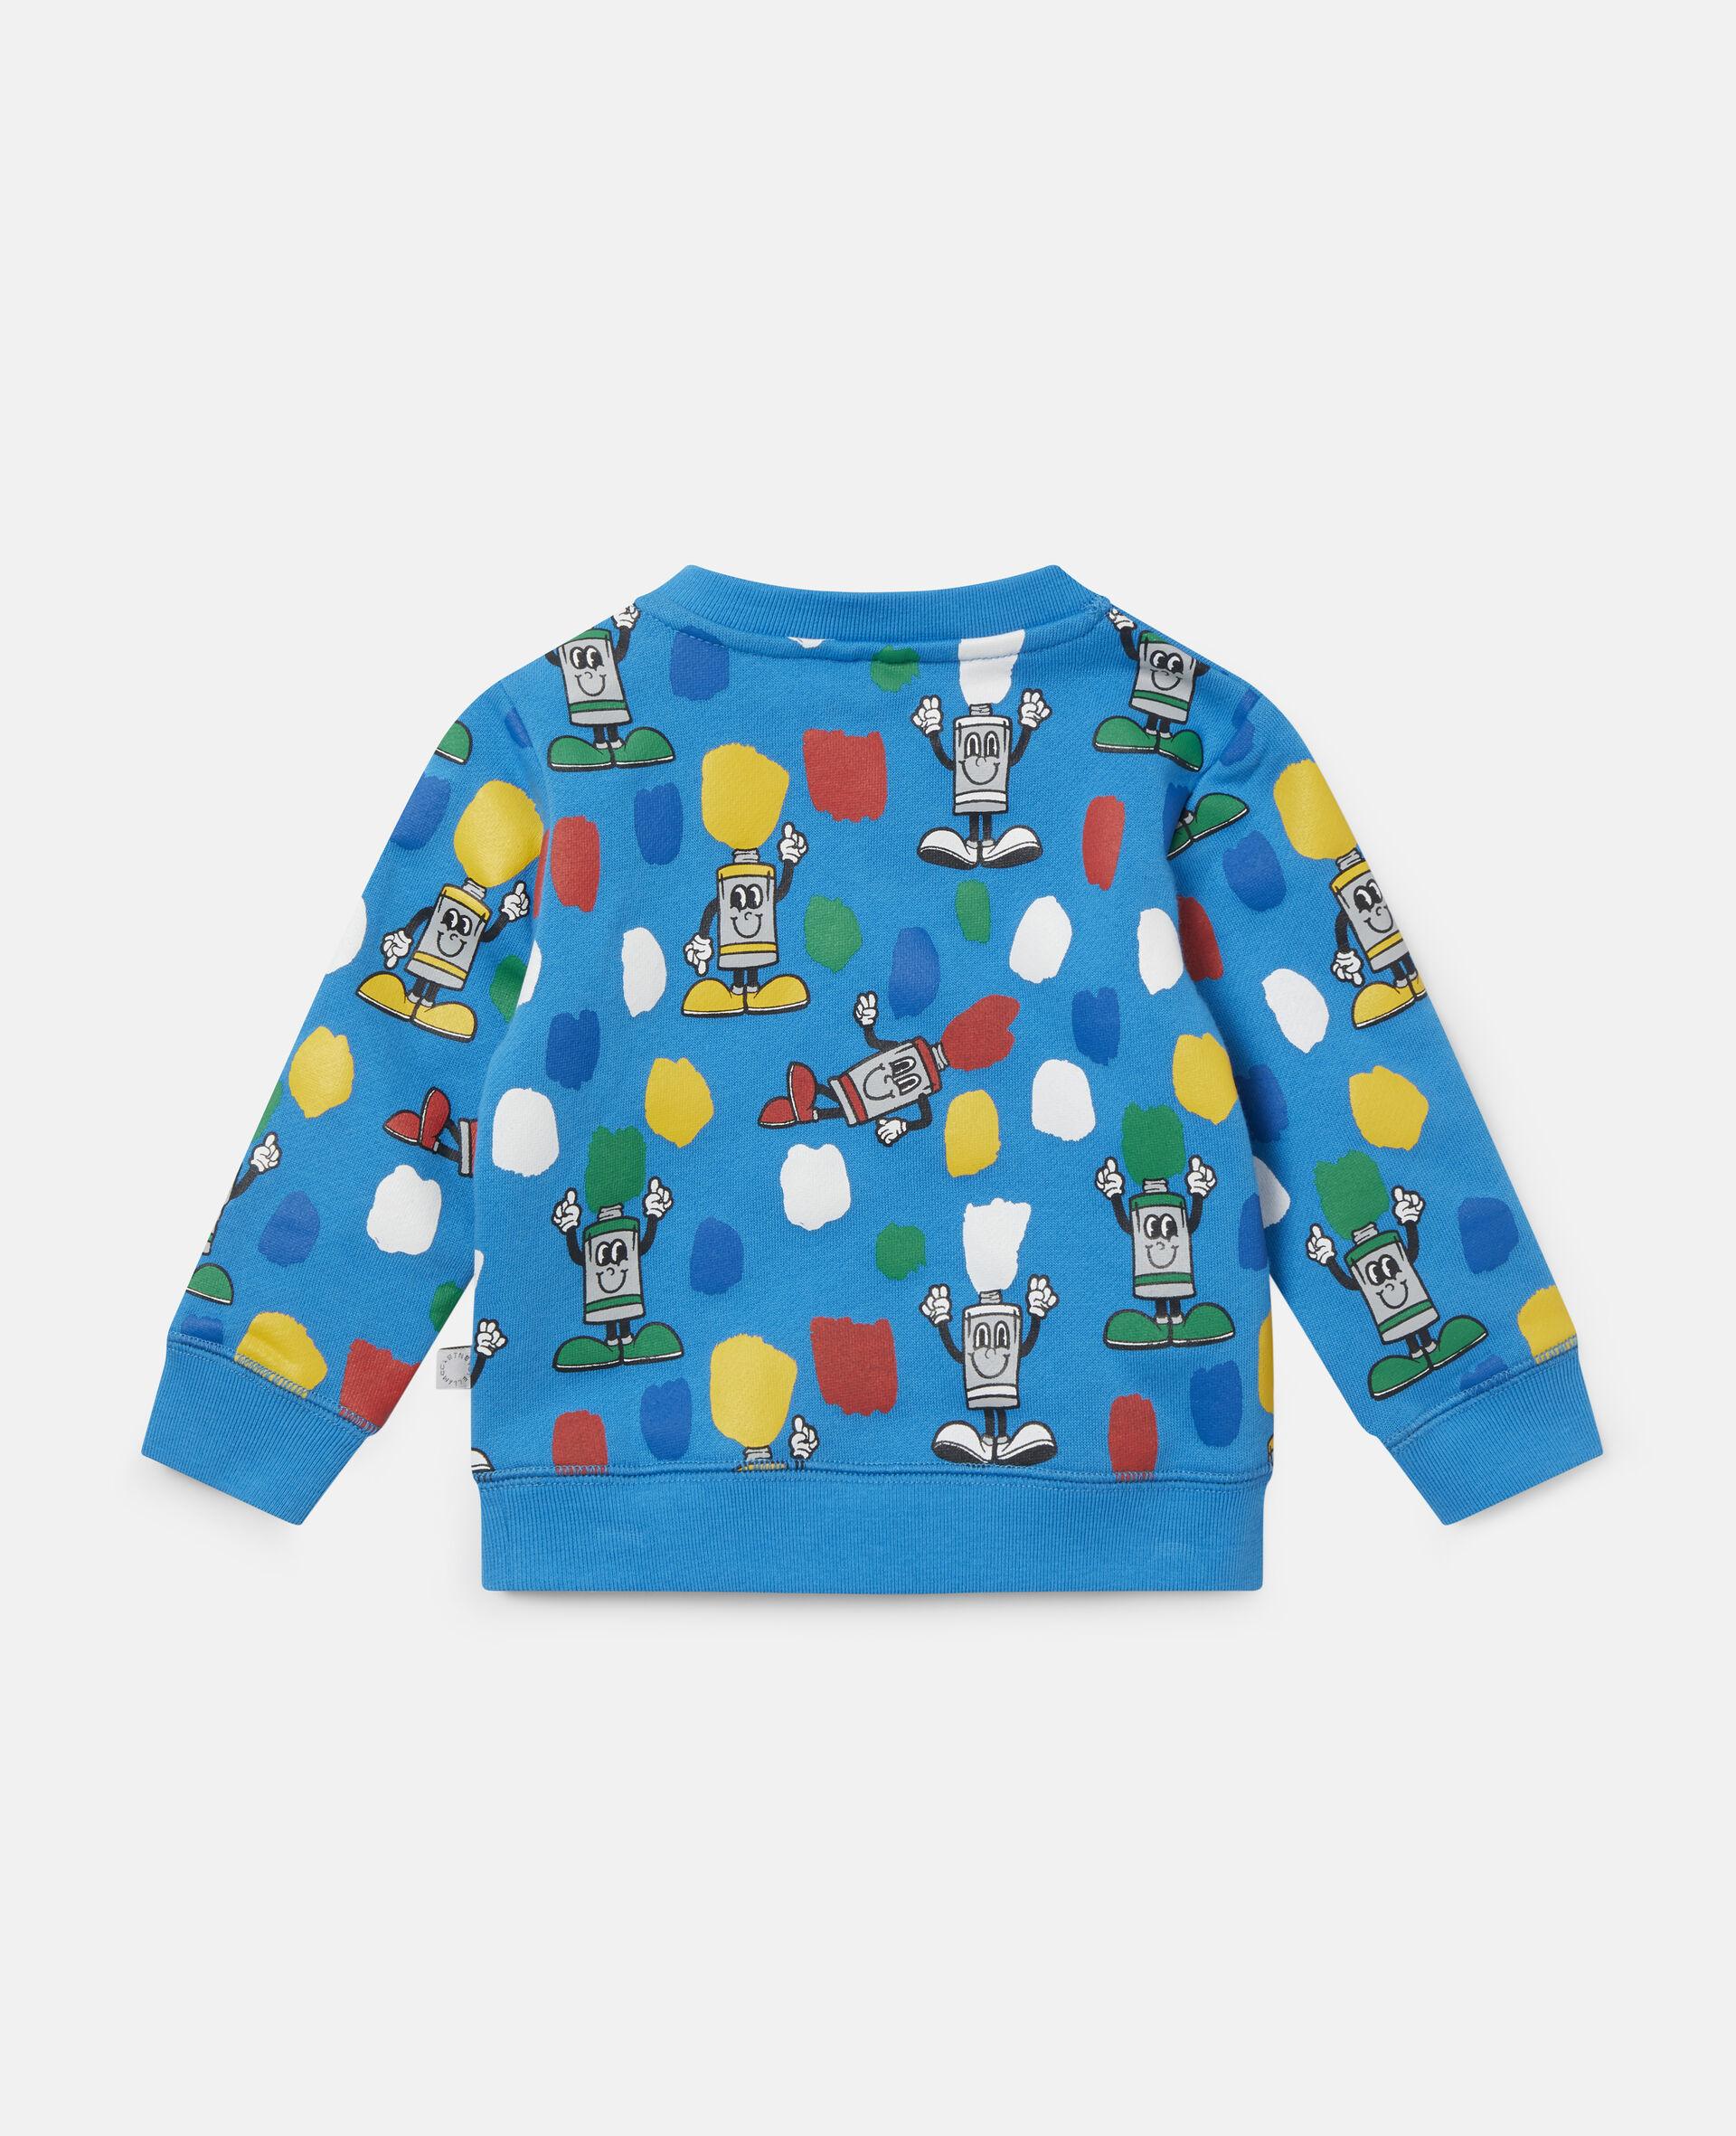 Paint Tubes Fleece Sweatshirt-Blue-large image number 3